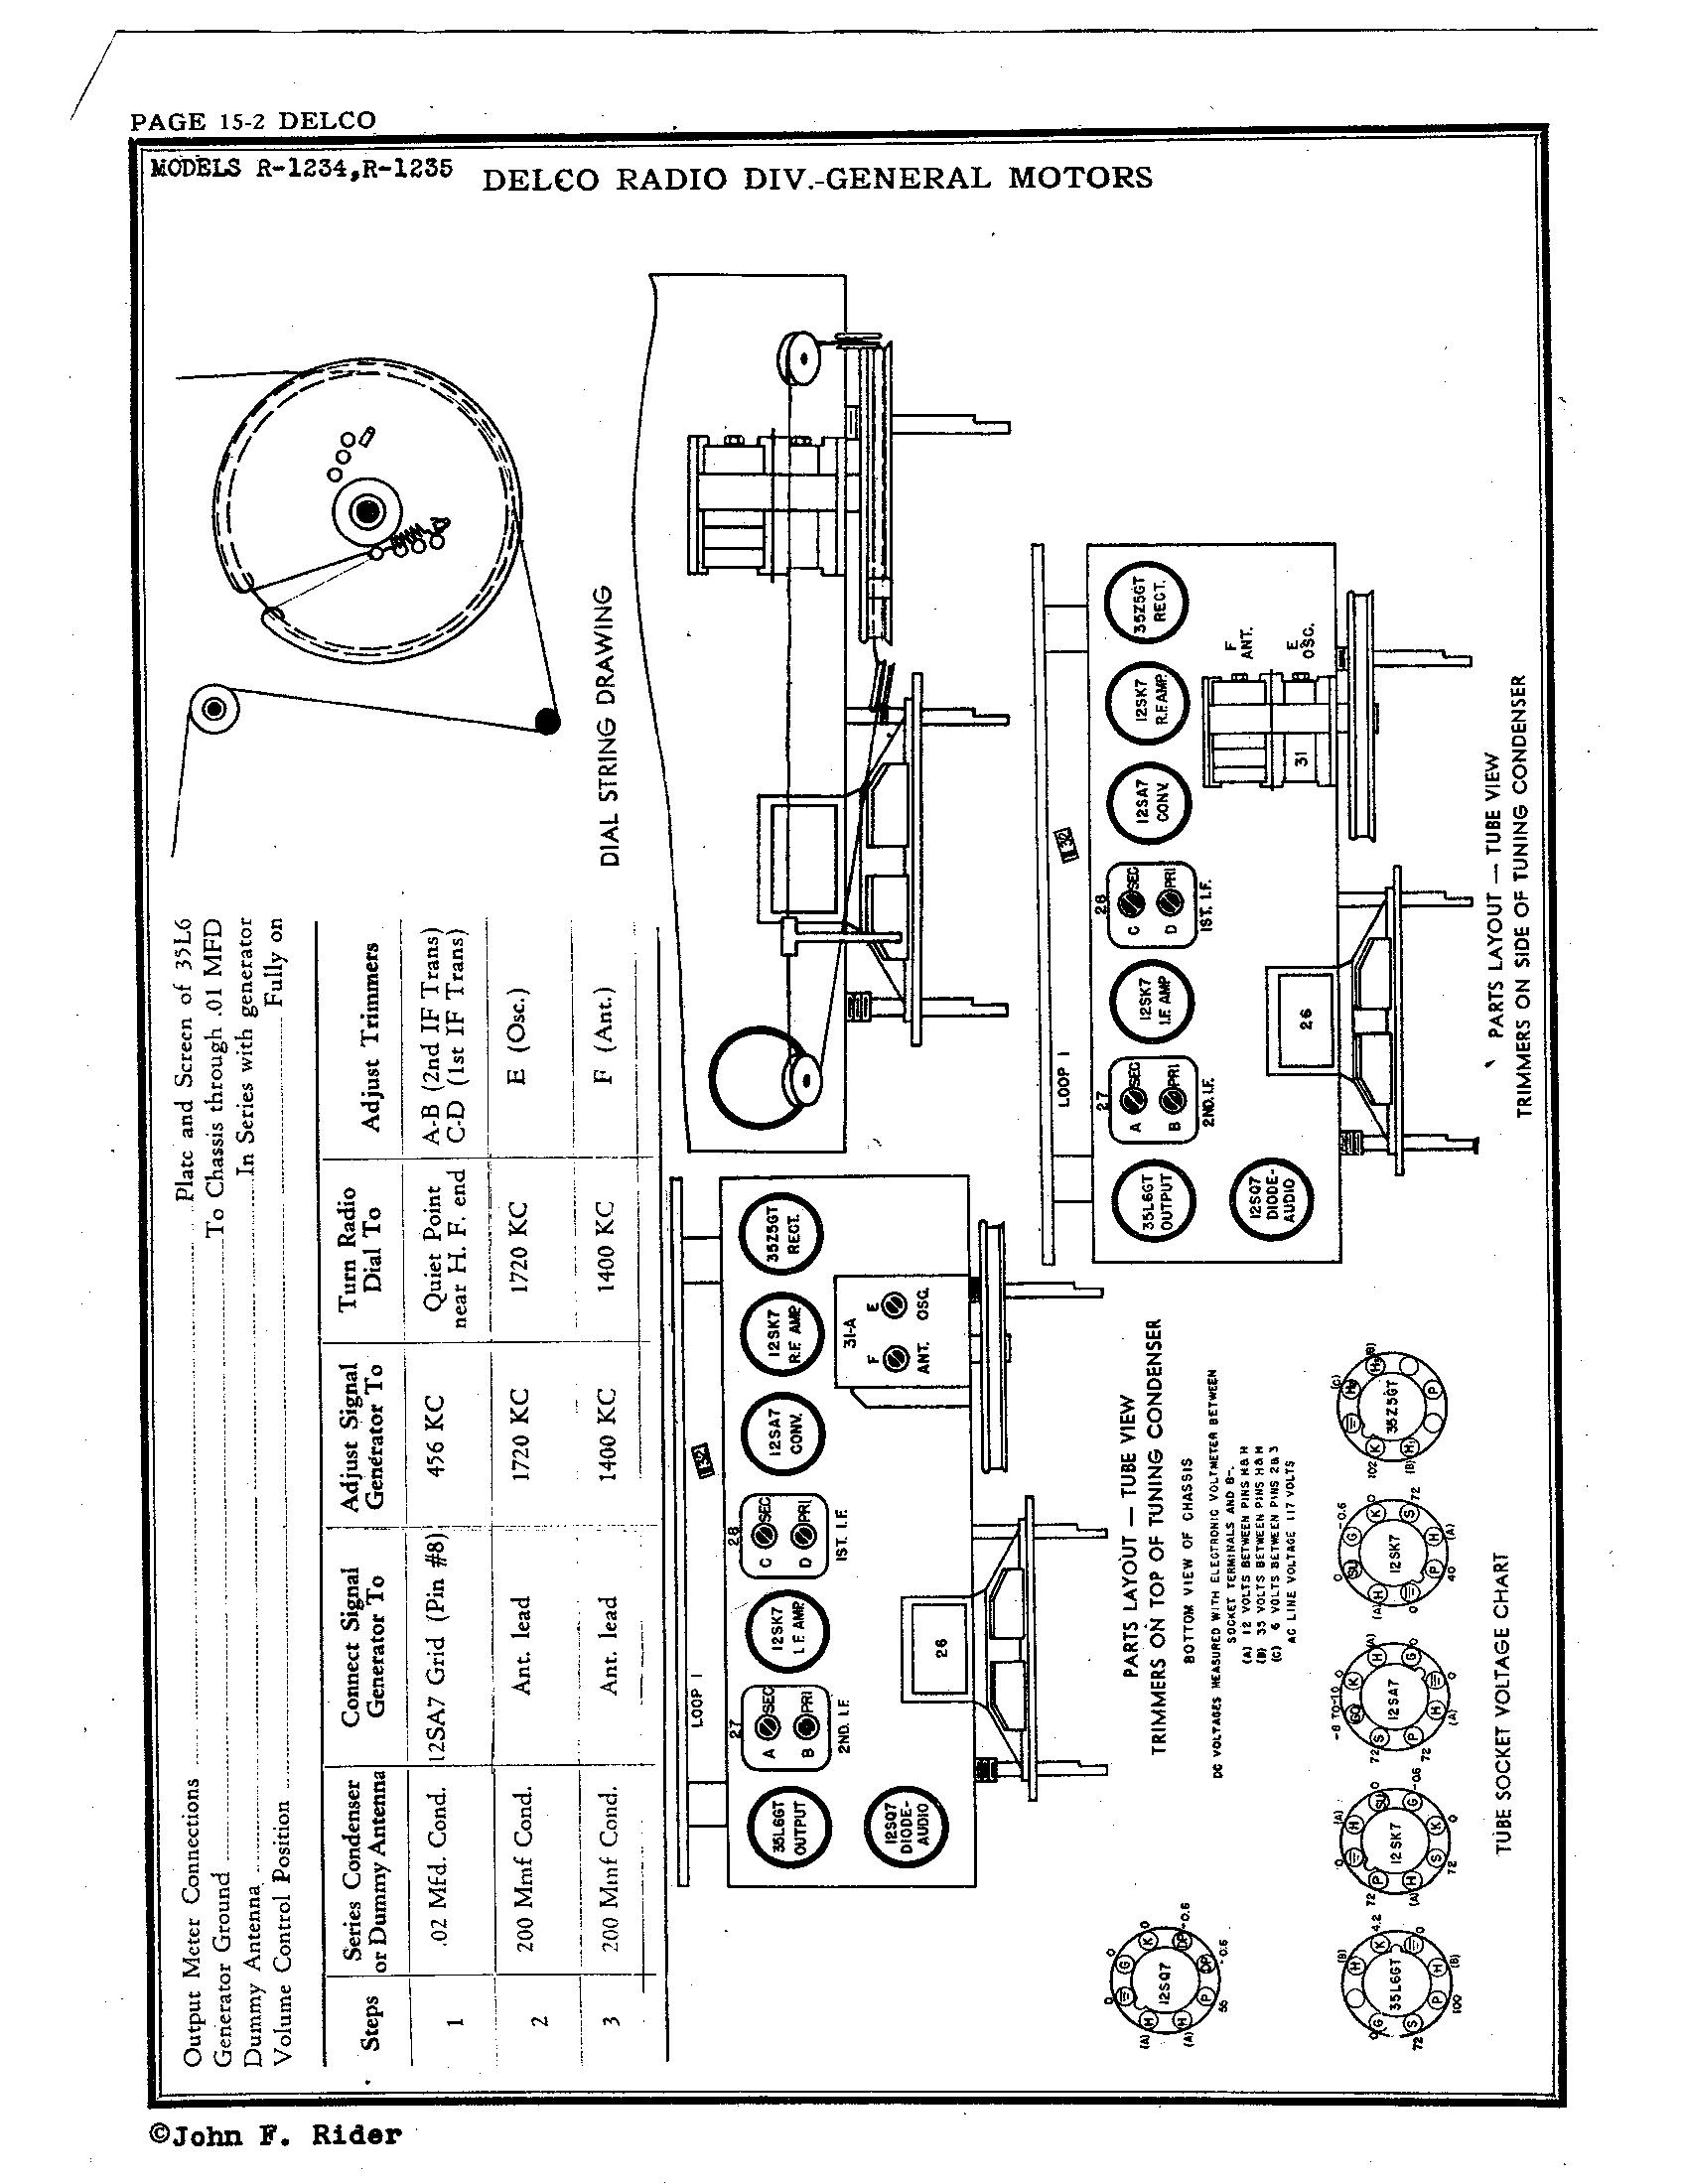 delco_radio_corp_r_1234_pg15-2 Radio Schematic Diagrams on sony tv, digital multimeter, samsung lcd tv, computer circuit board, hvac system,